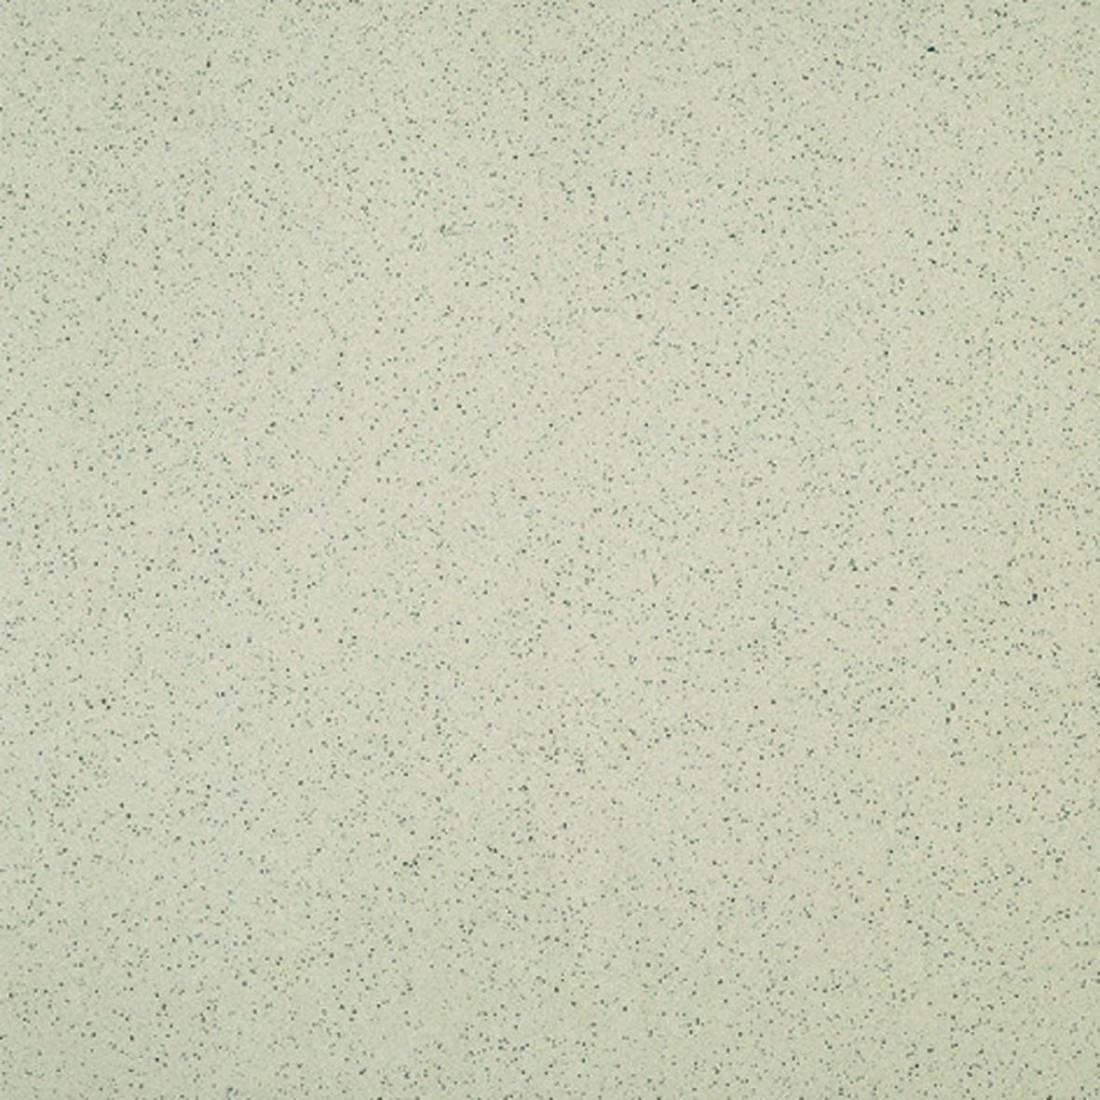 Granit 30x30 Tunis Beige Matt R9 1